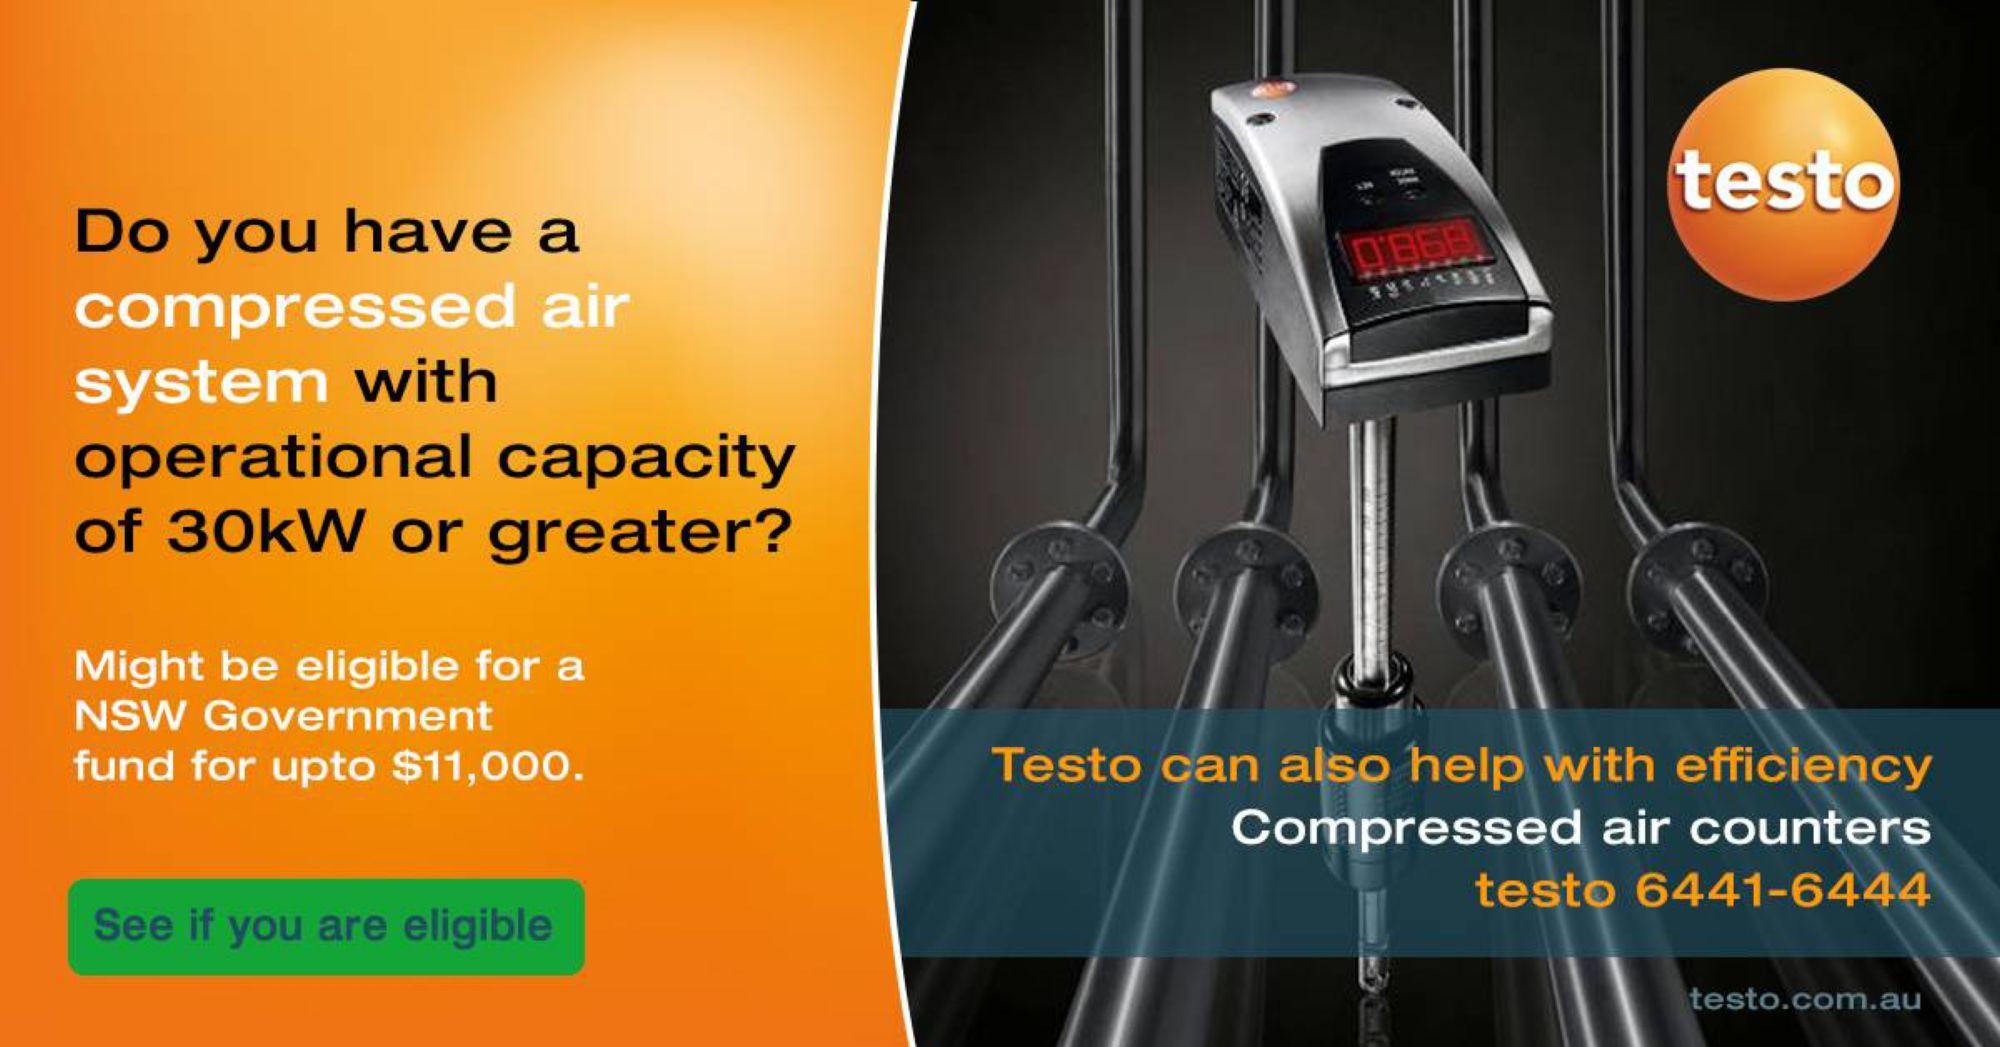 testo-6441-6444-Compressed-Air-NSW-Fund-ii.jpg